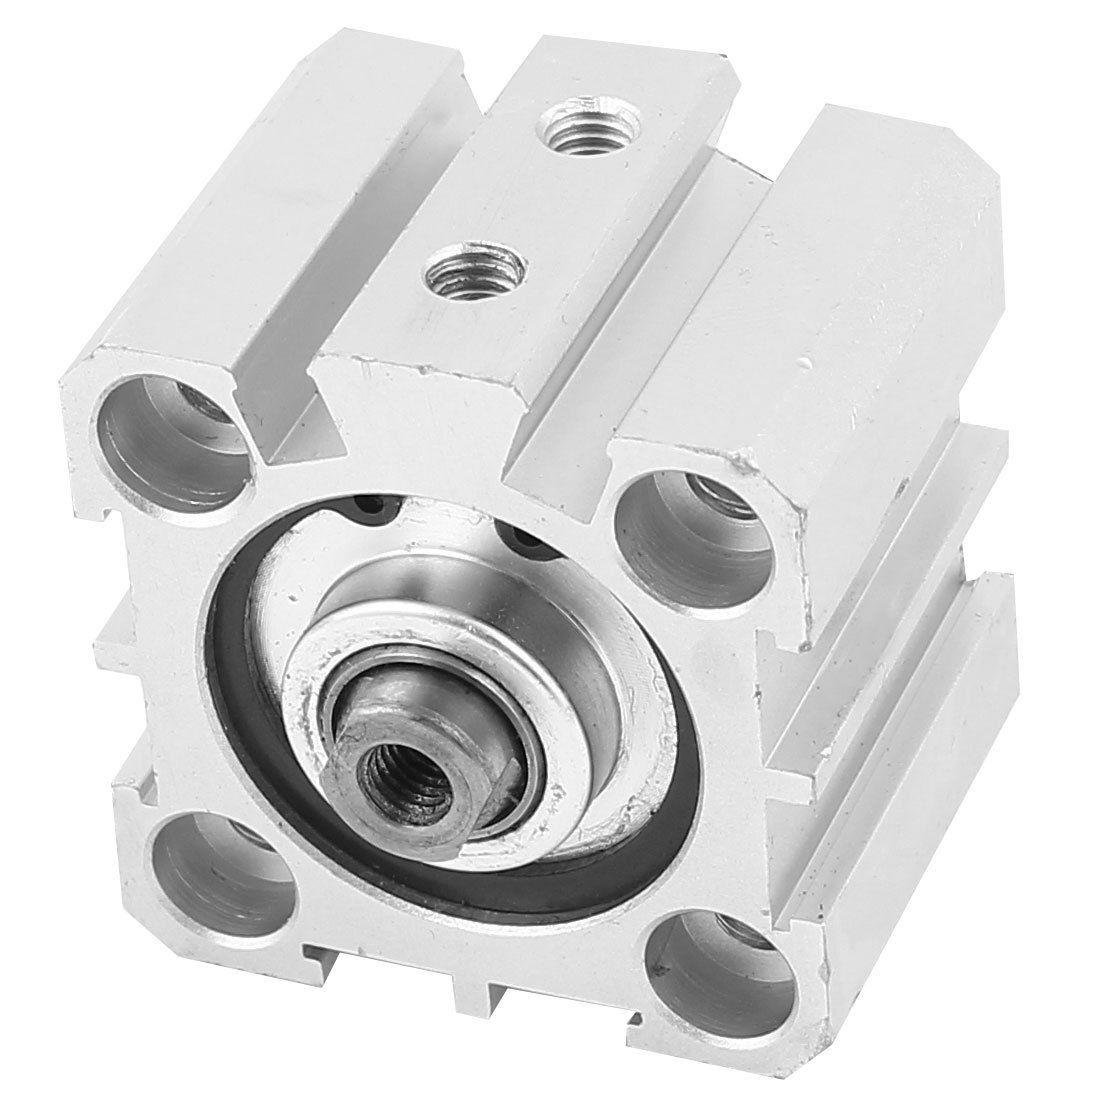 1 Pcs 25mm Bore 80mm Stroke Stainless steel Pneumatic Air Cylinder SDA25-80 1 pcs 50mm bore 25mm stroke stainless steel pneumatic air cylinder sda50 25